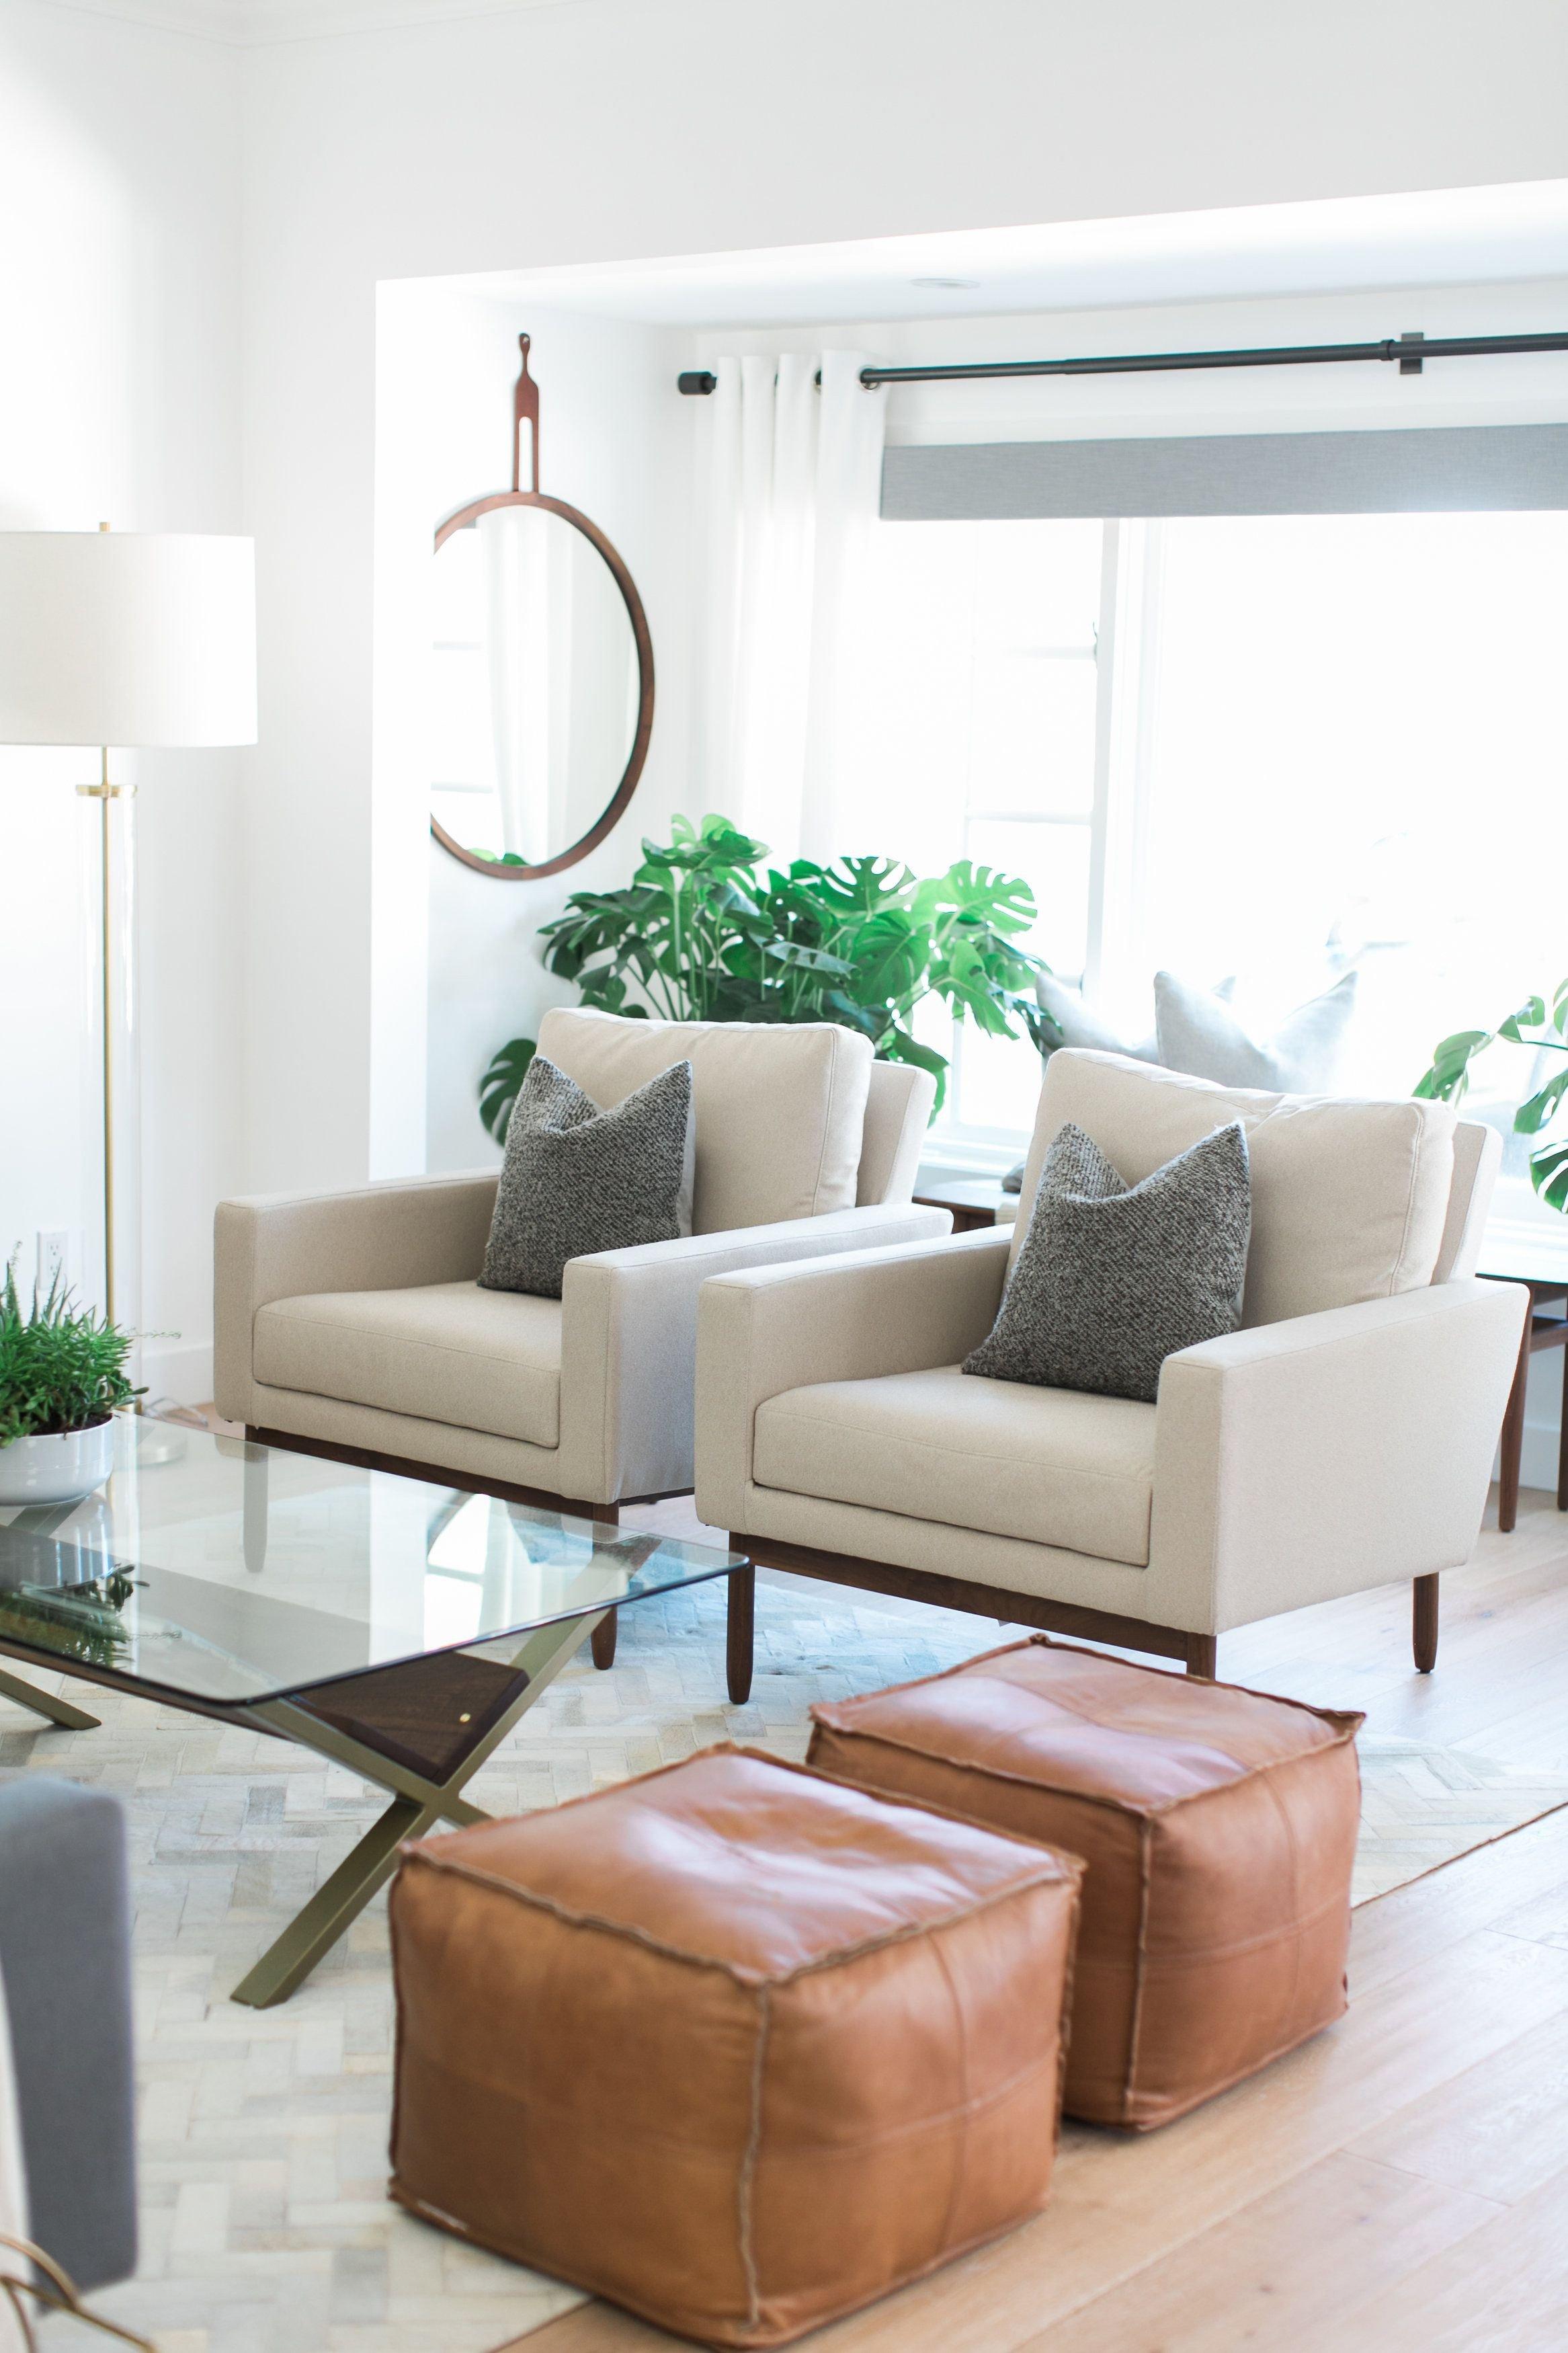 Comfortable Living Room Mid Century Lindye Galloway Interiors Mid Century Modern Interior